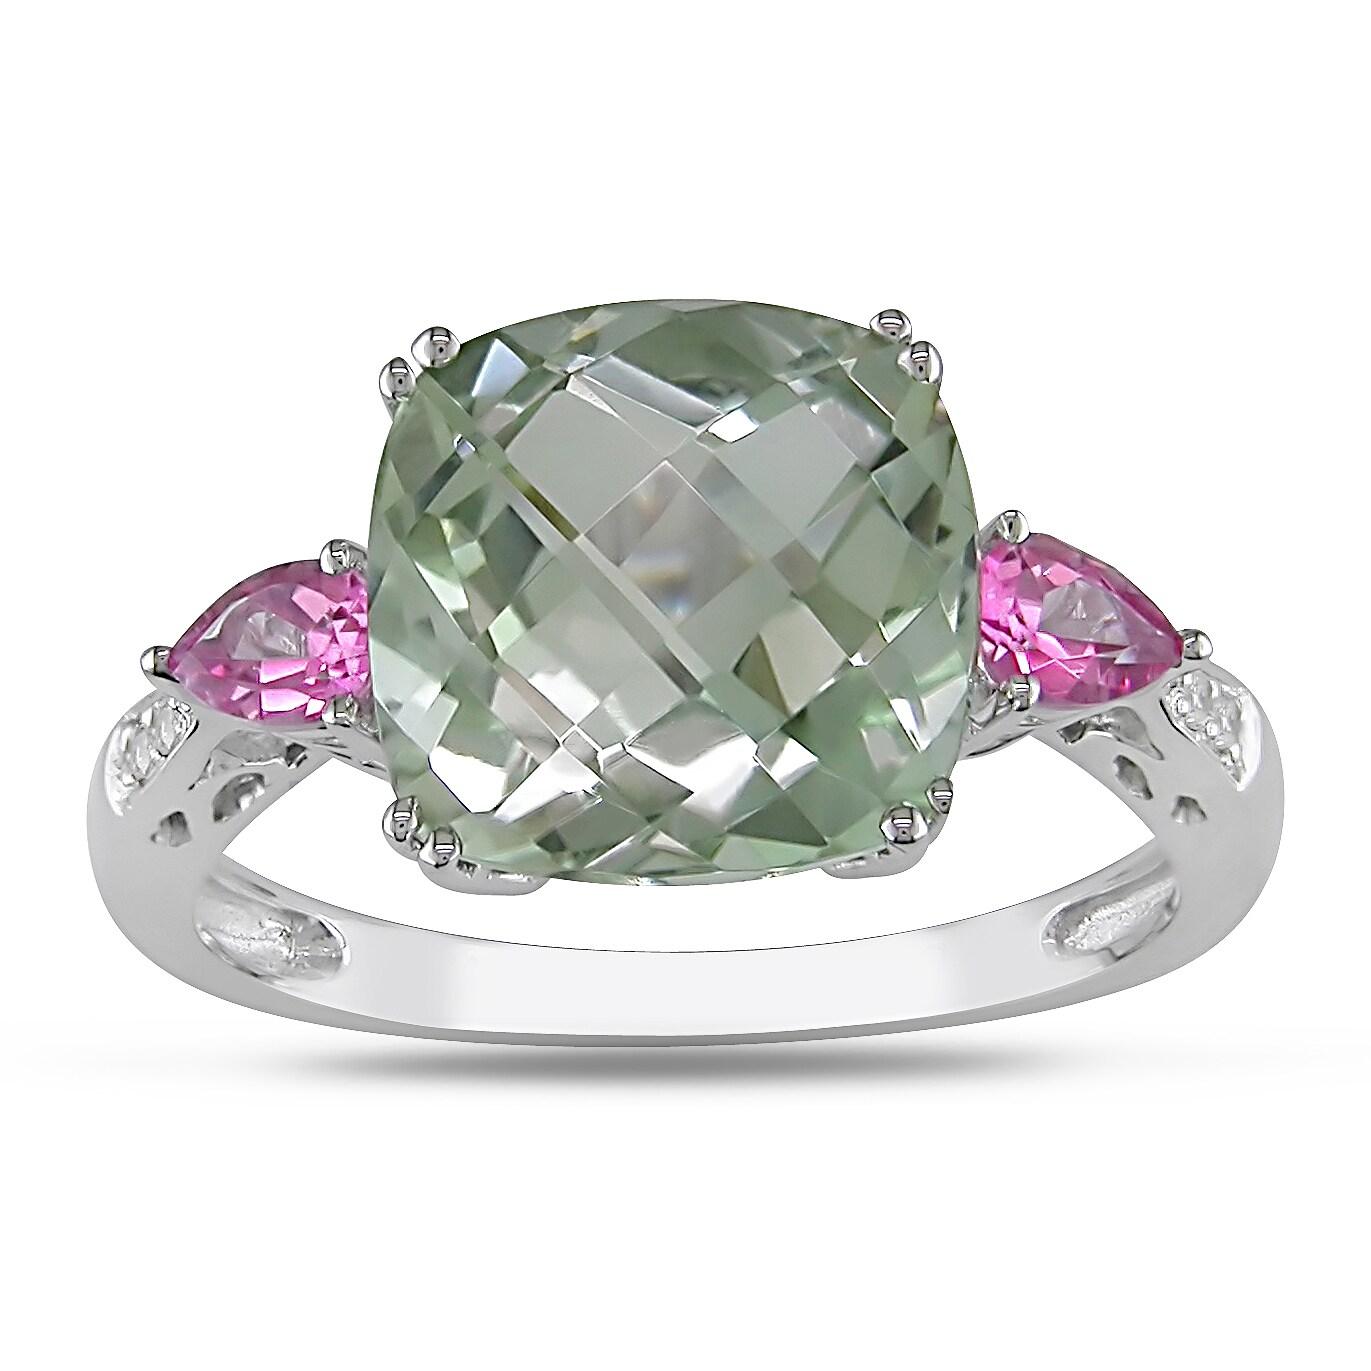 Miadora 10k White Gold Gemstone and Diamond Ring (H-I, I2-I3)